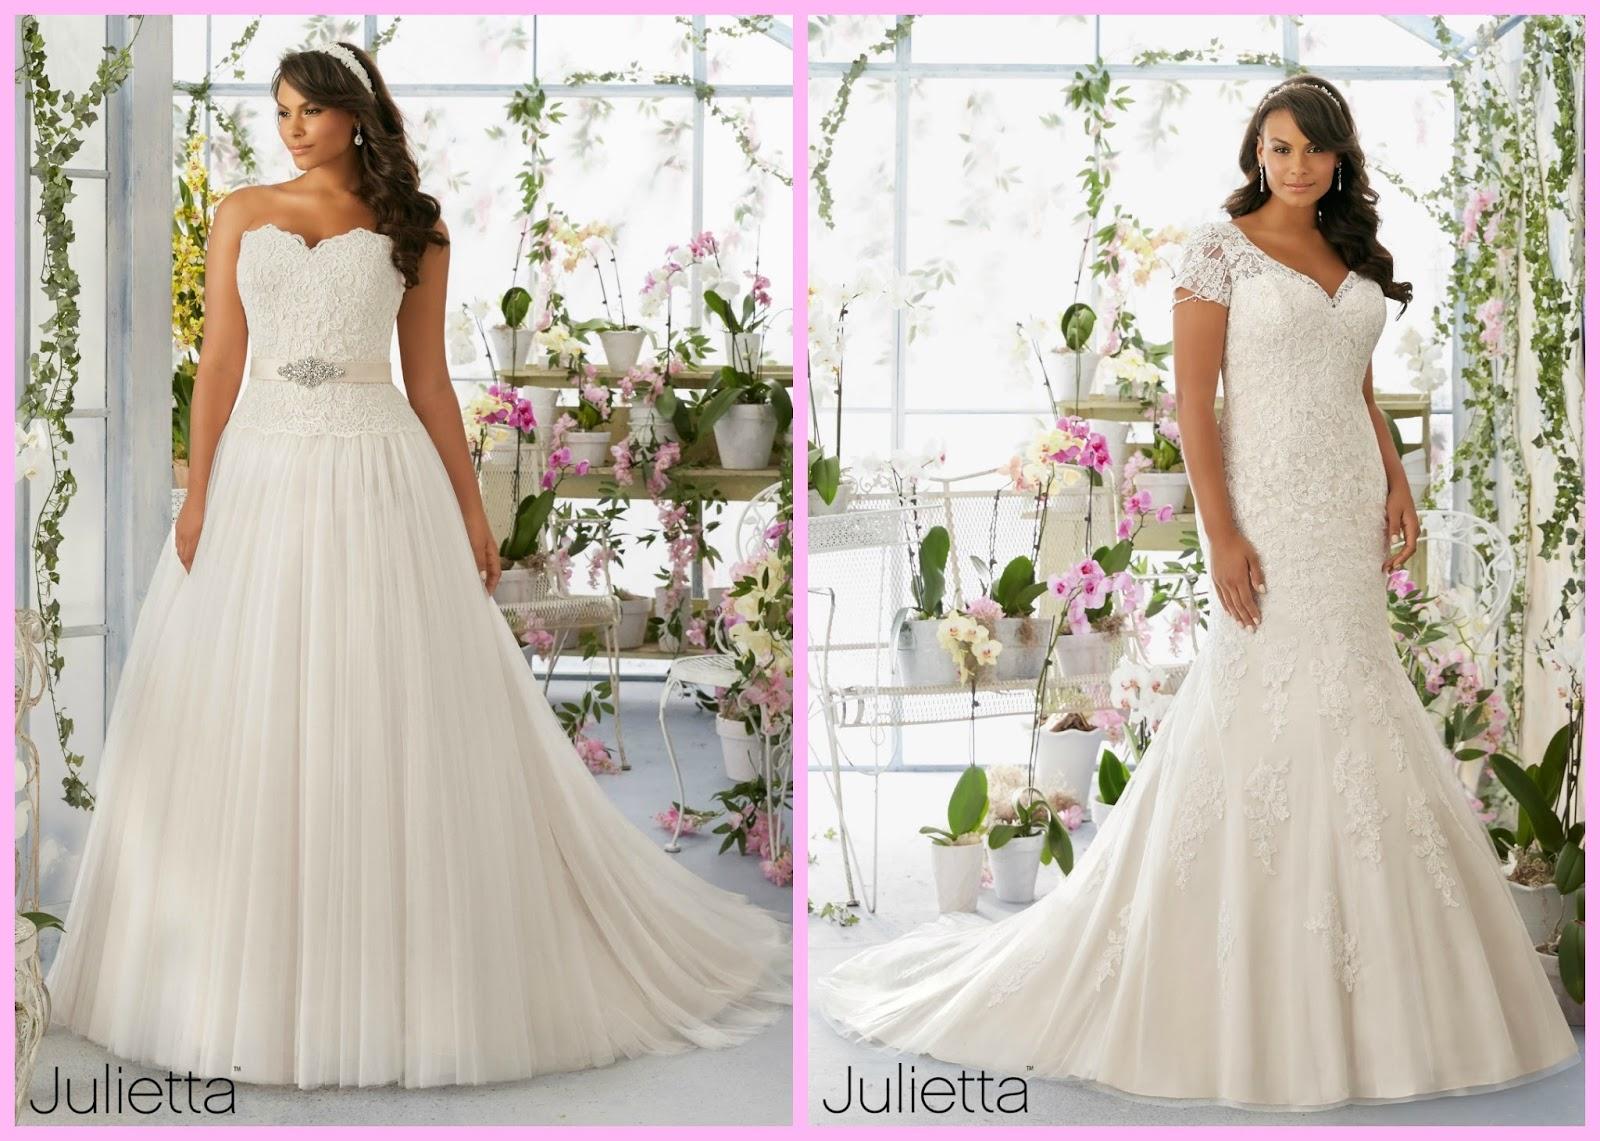 Brides of America Online Store: October 2015